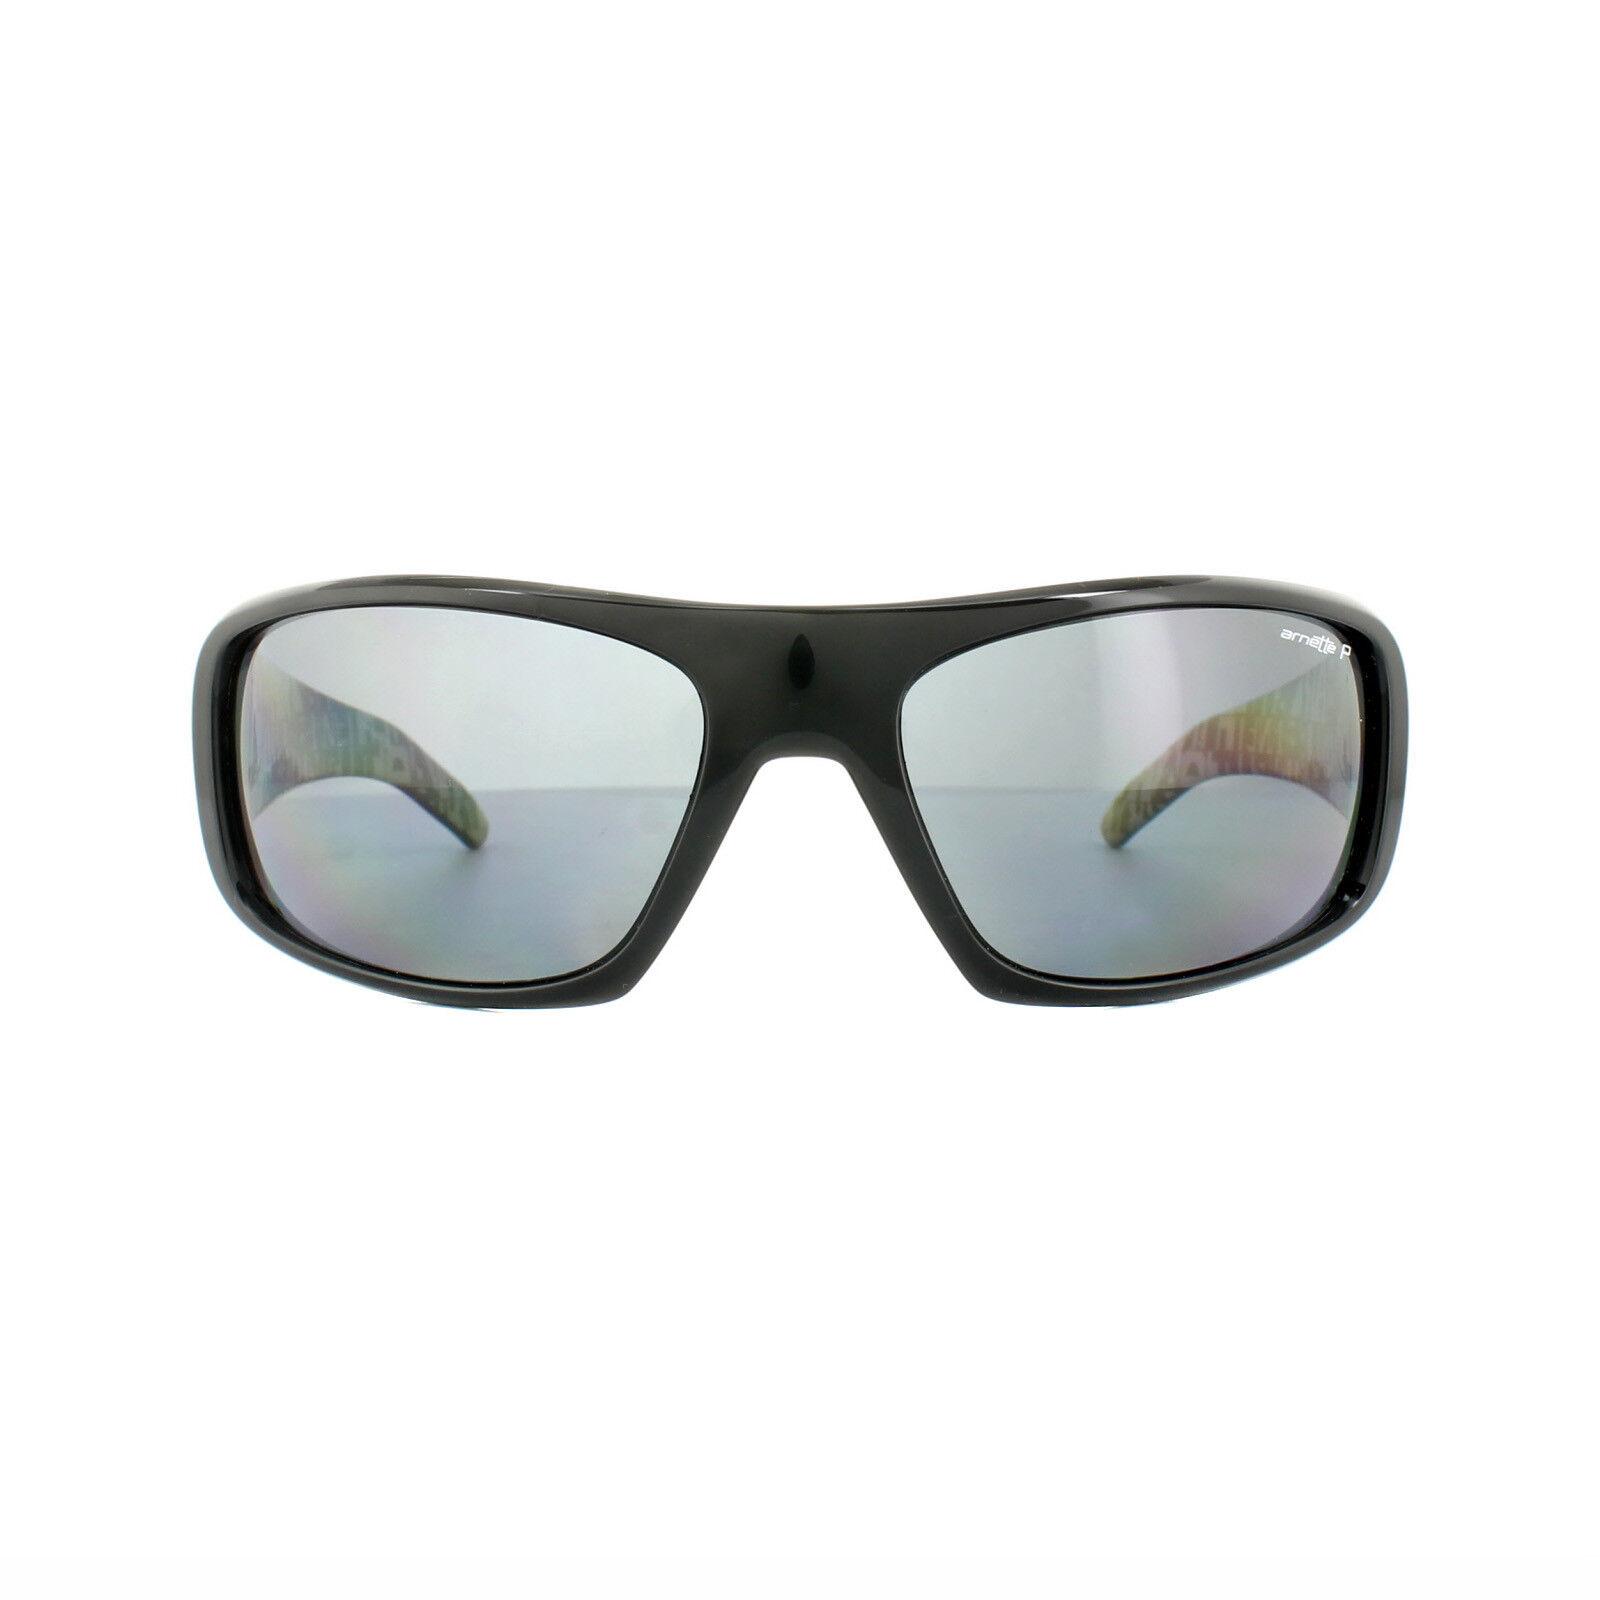 4b955a19431d Buy Arnette Hot Shot Sunglasses Shiny Black Polarized Grey an 4182 ...